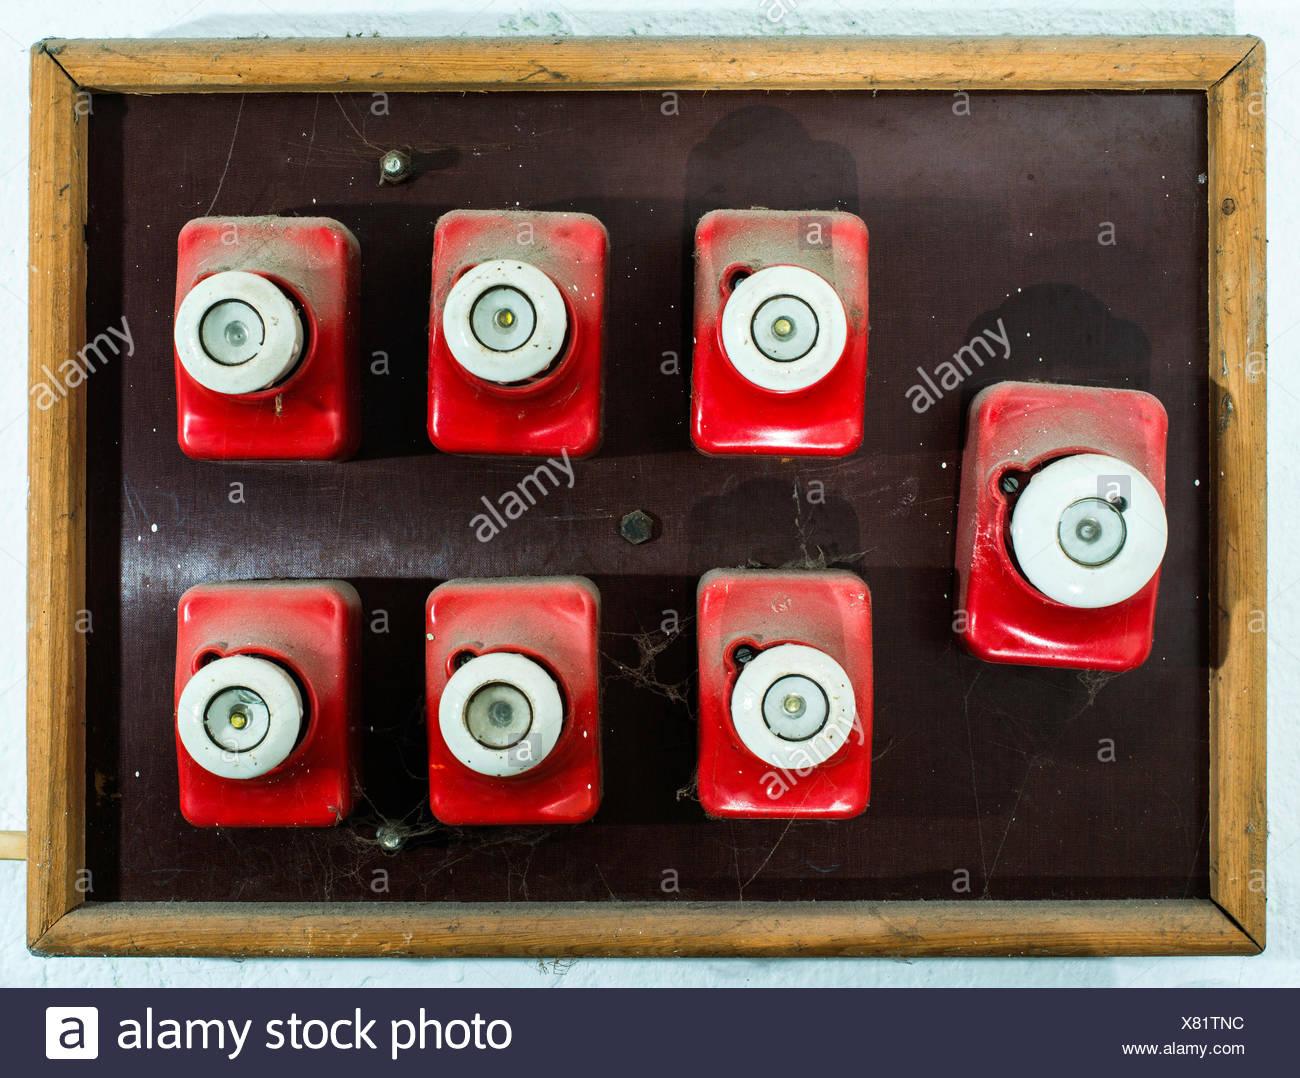 Red vintage electrical fuse. Switchboard Stock Photo ... on vintage fuse panel, vintage automotive fuse box, vintage electric fuse box, vintage safety deposit box, vintage home fuse box,